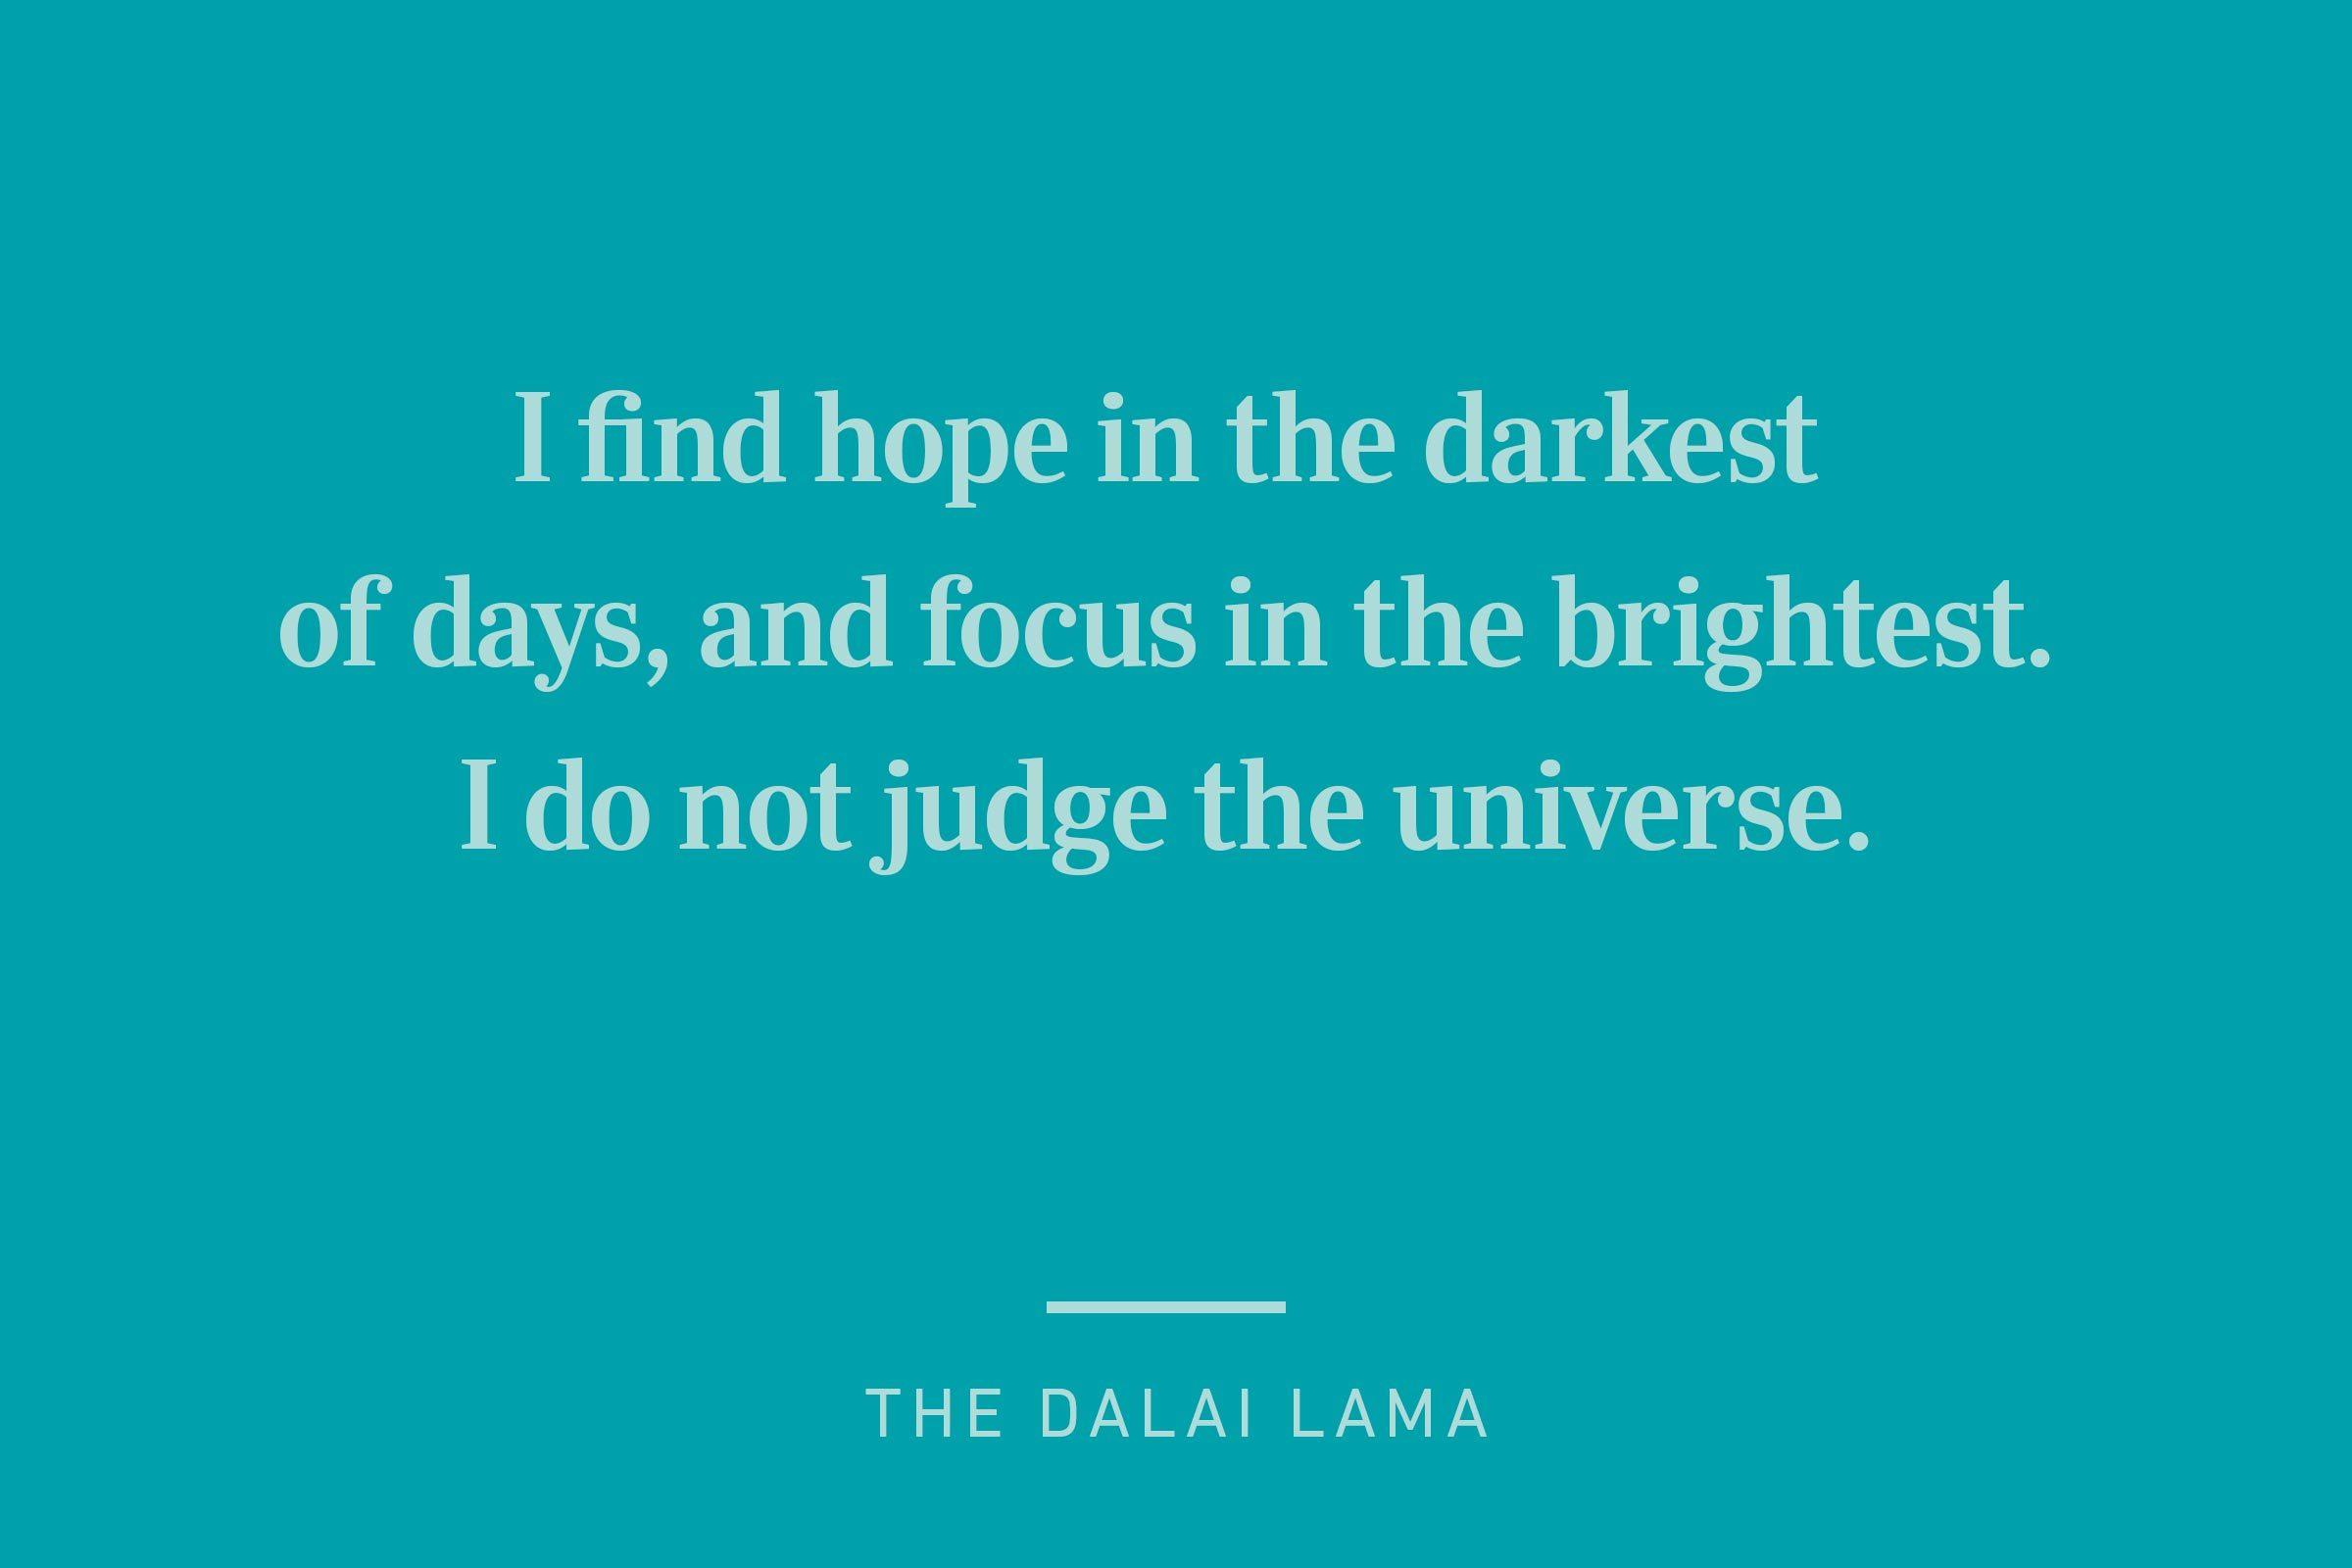 the dalai lama happiness quote